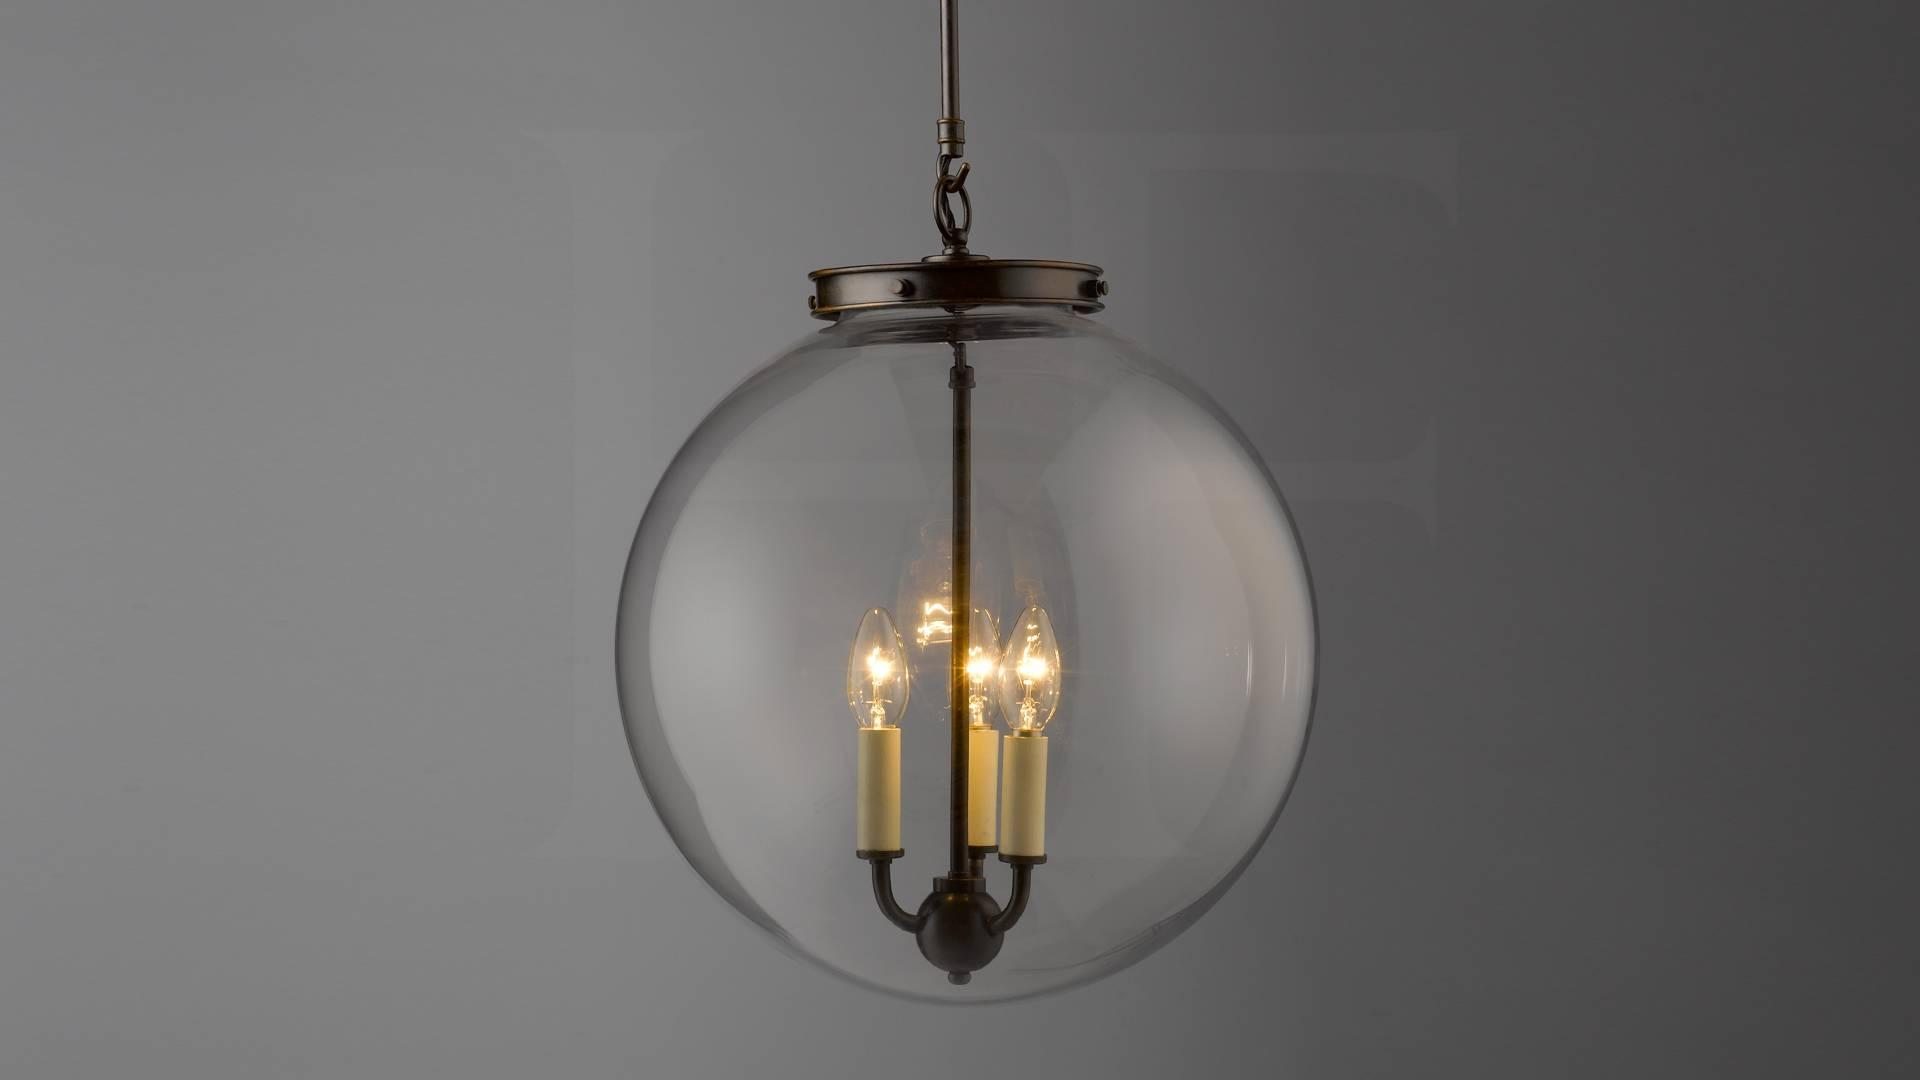 Buy Chandeliers, Pendant Ceiling Lighting, Brass Pendant Lights within  Large Glass Ball Pendant Lights